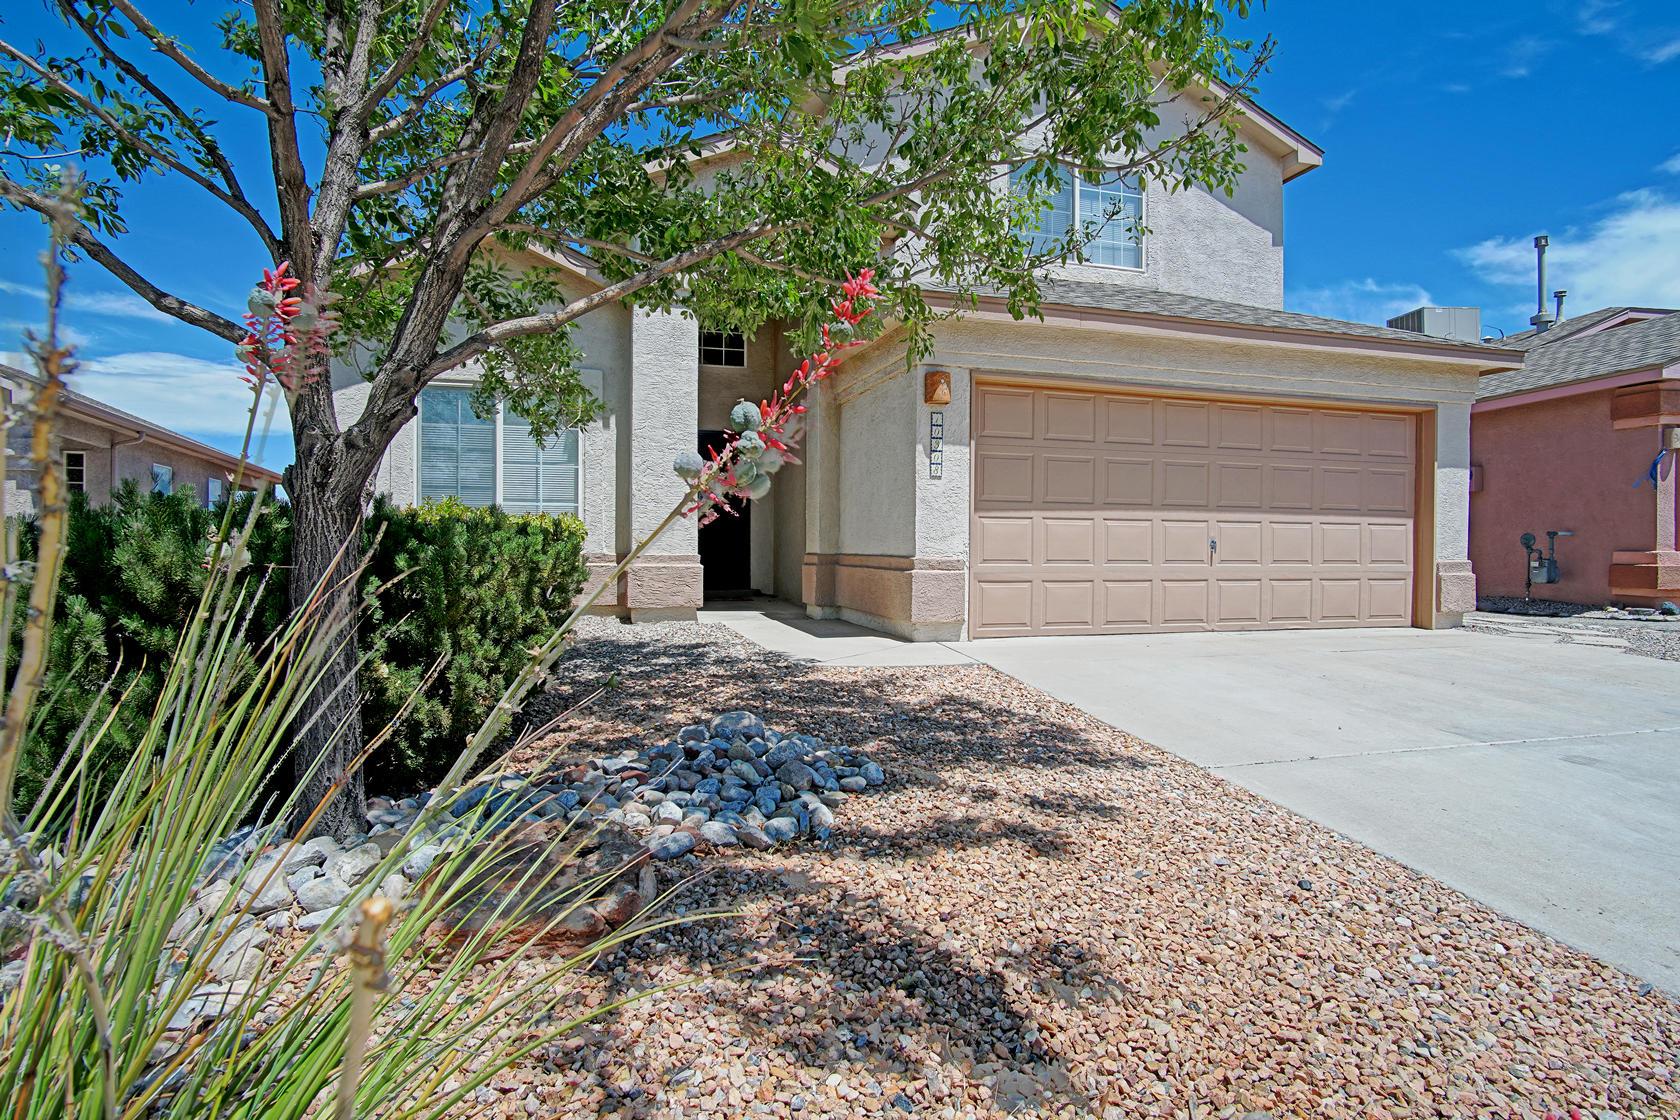 10308 CALLE DICHOSO Court NW Property Photo - Albuquerque, NM real estate listing